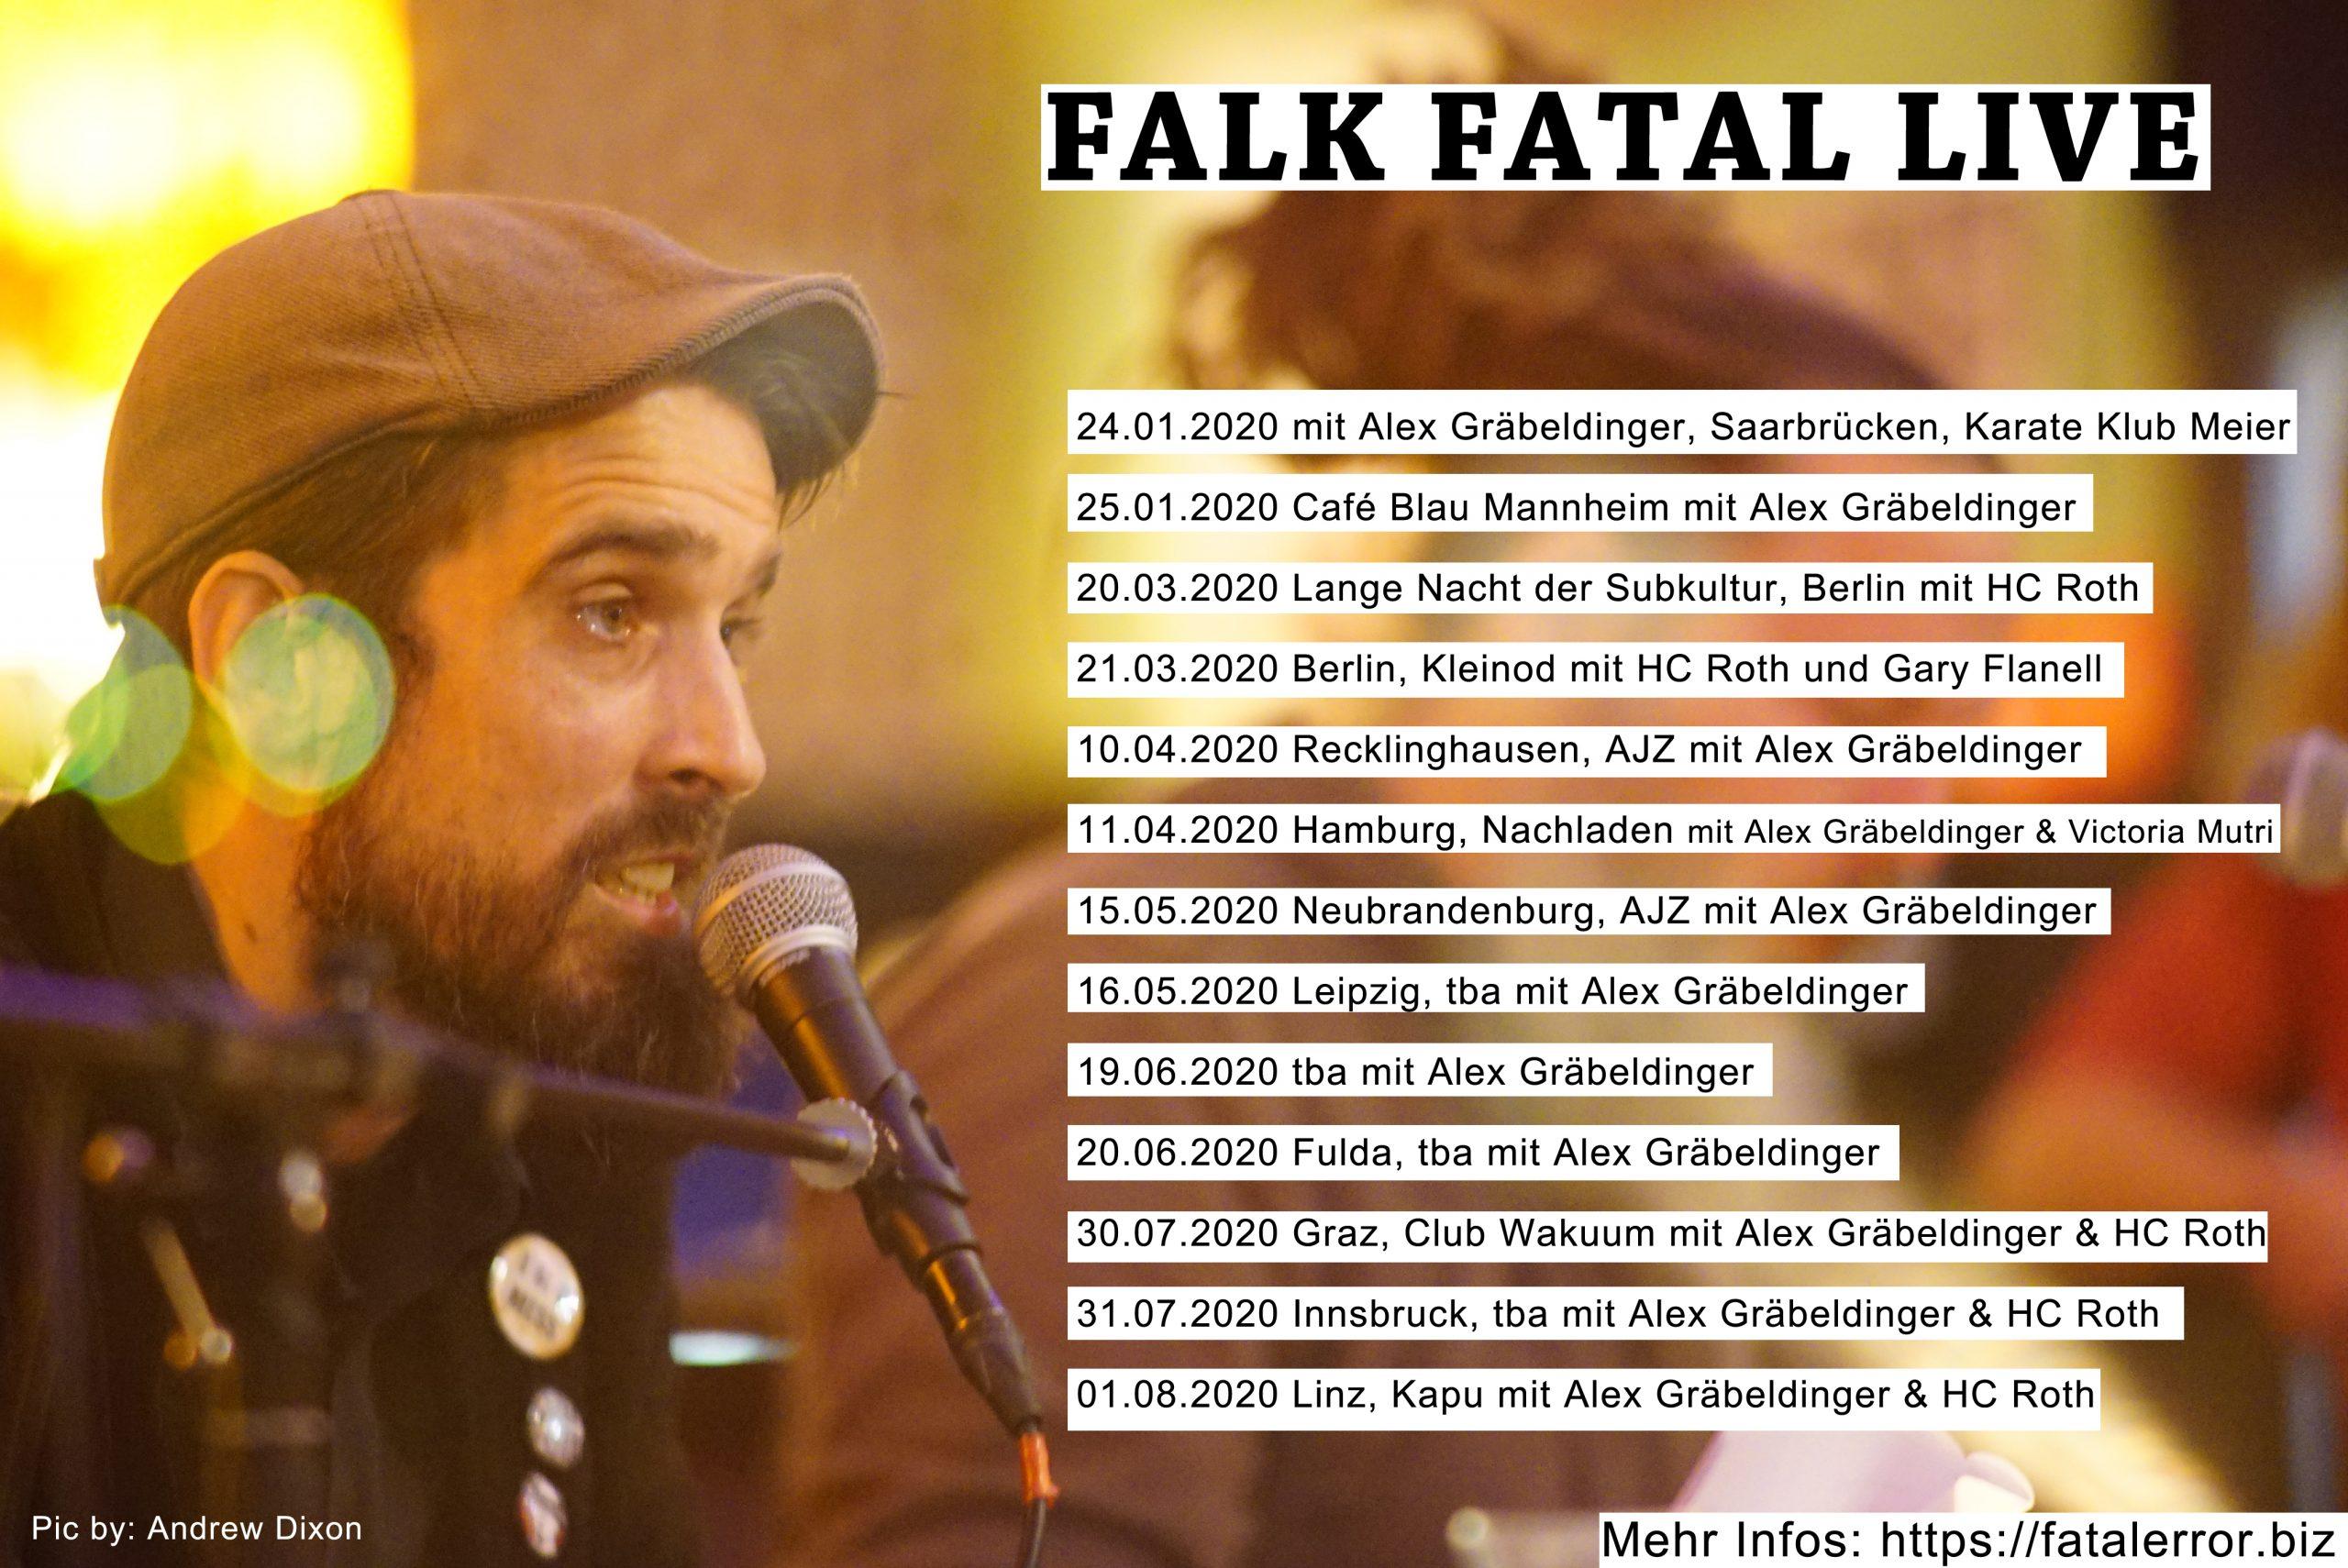 Falk Fatal live